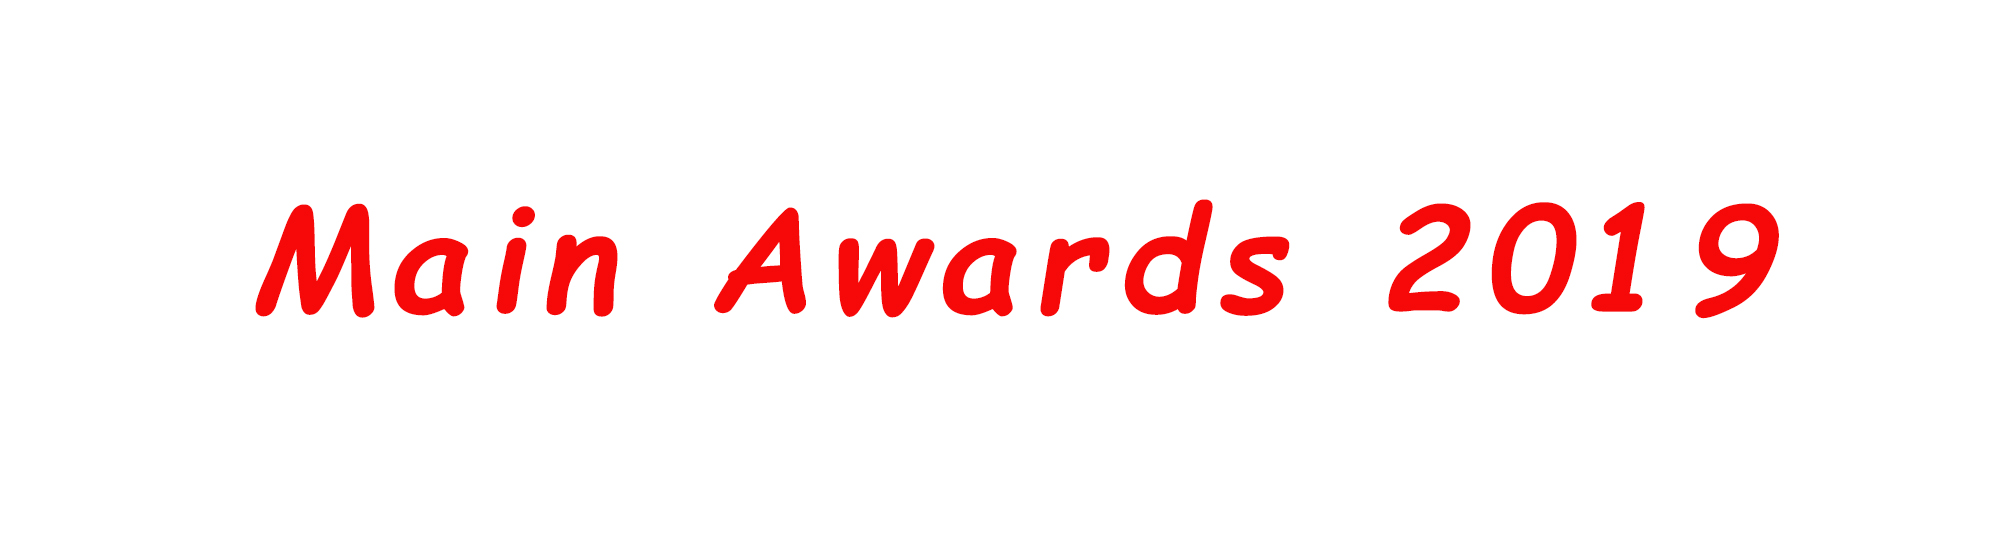 Main awards 2019.jpg